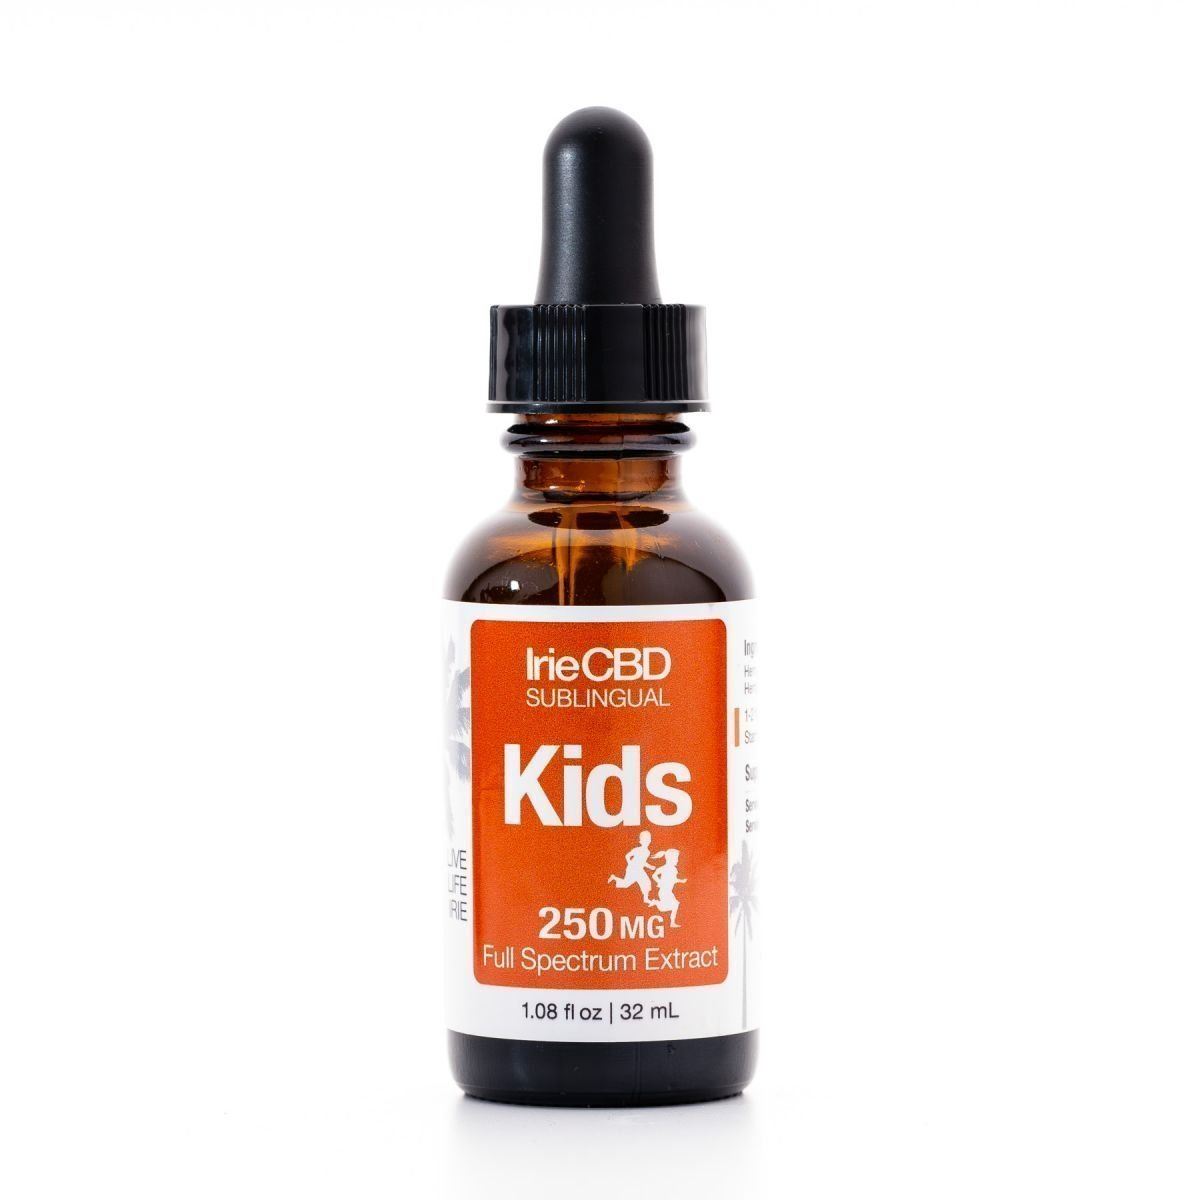 IrieCBD Kids CBD Oil Tincture